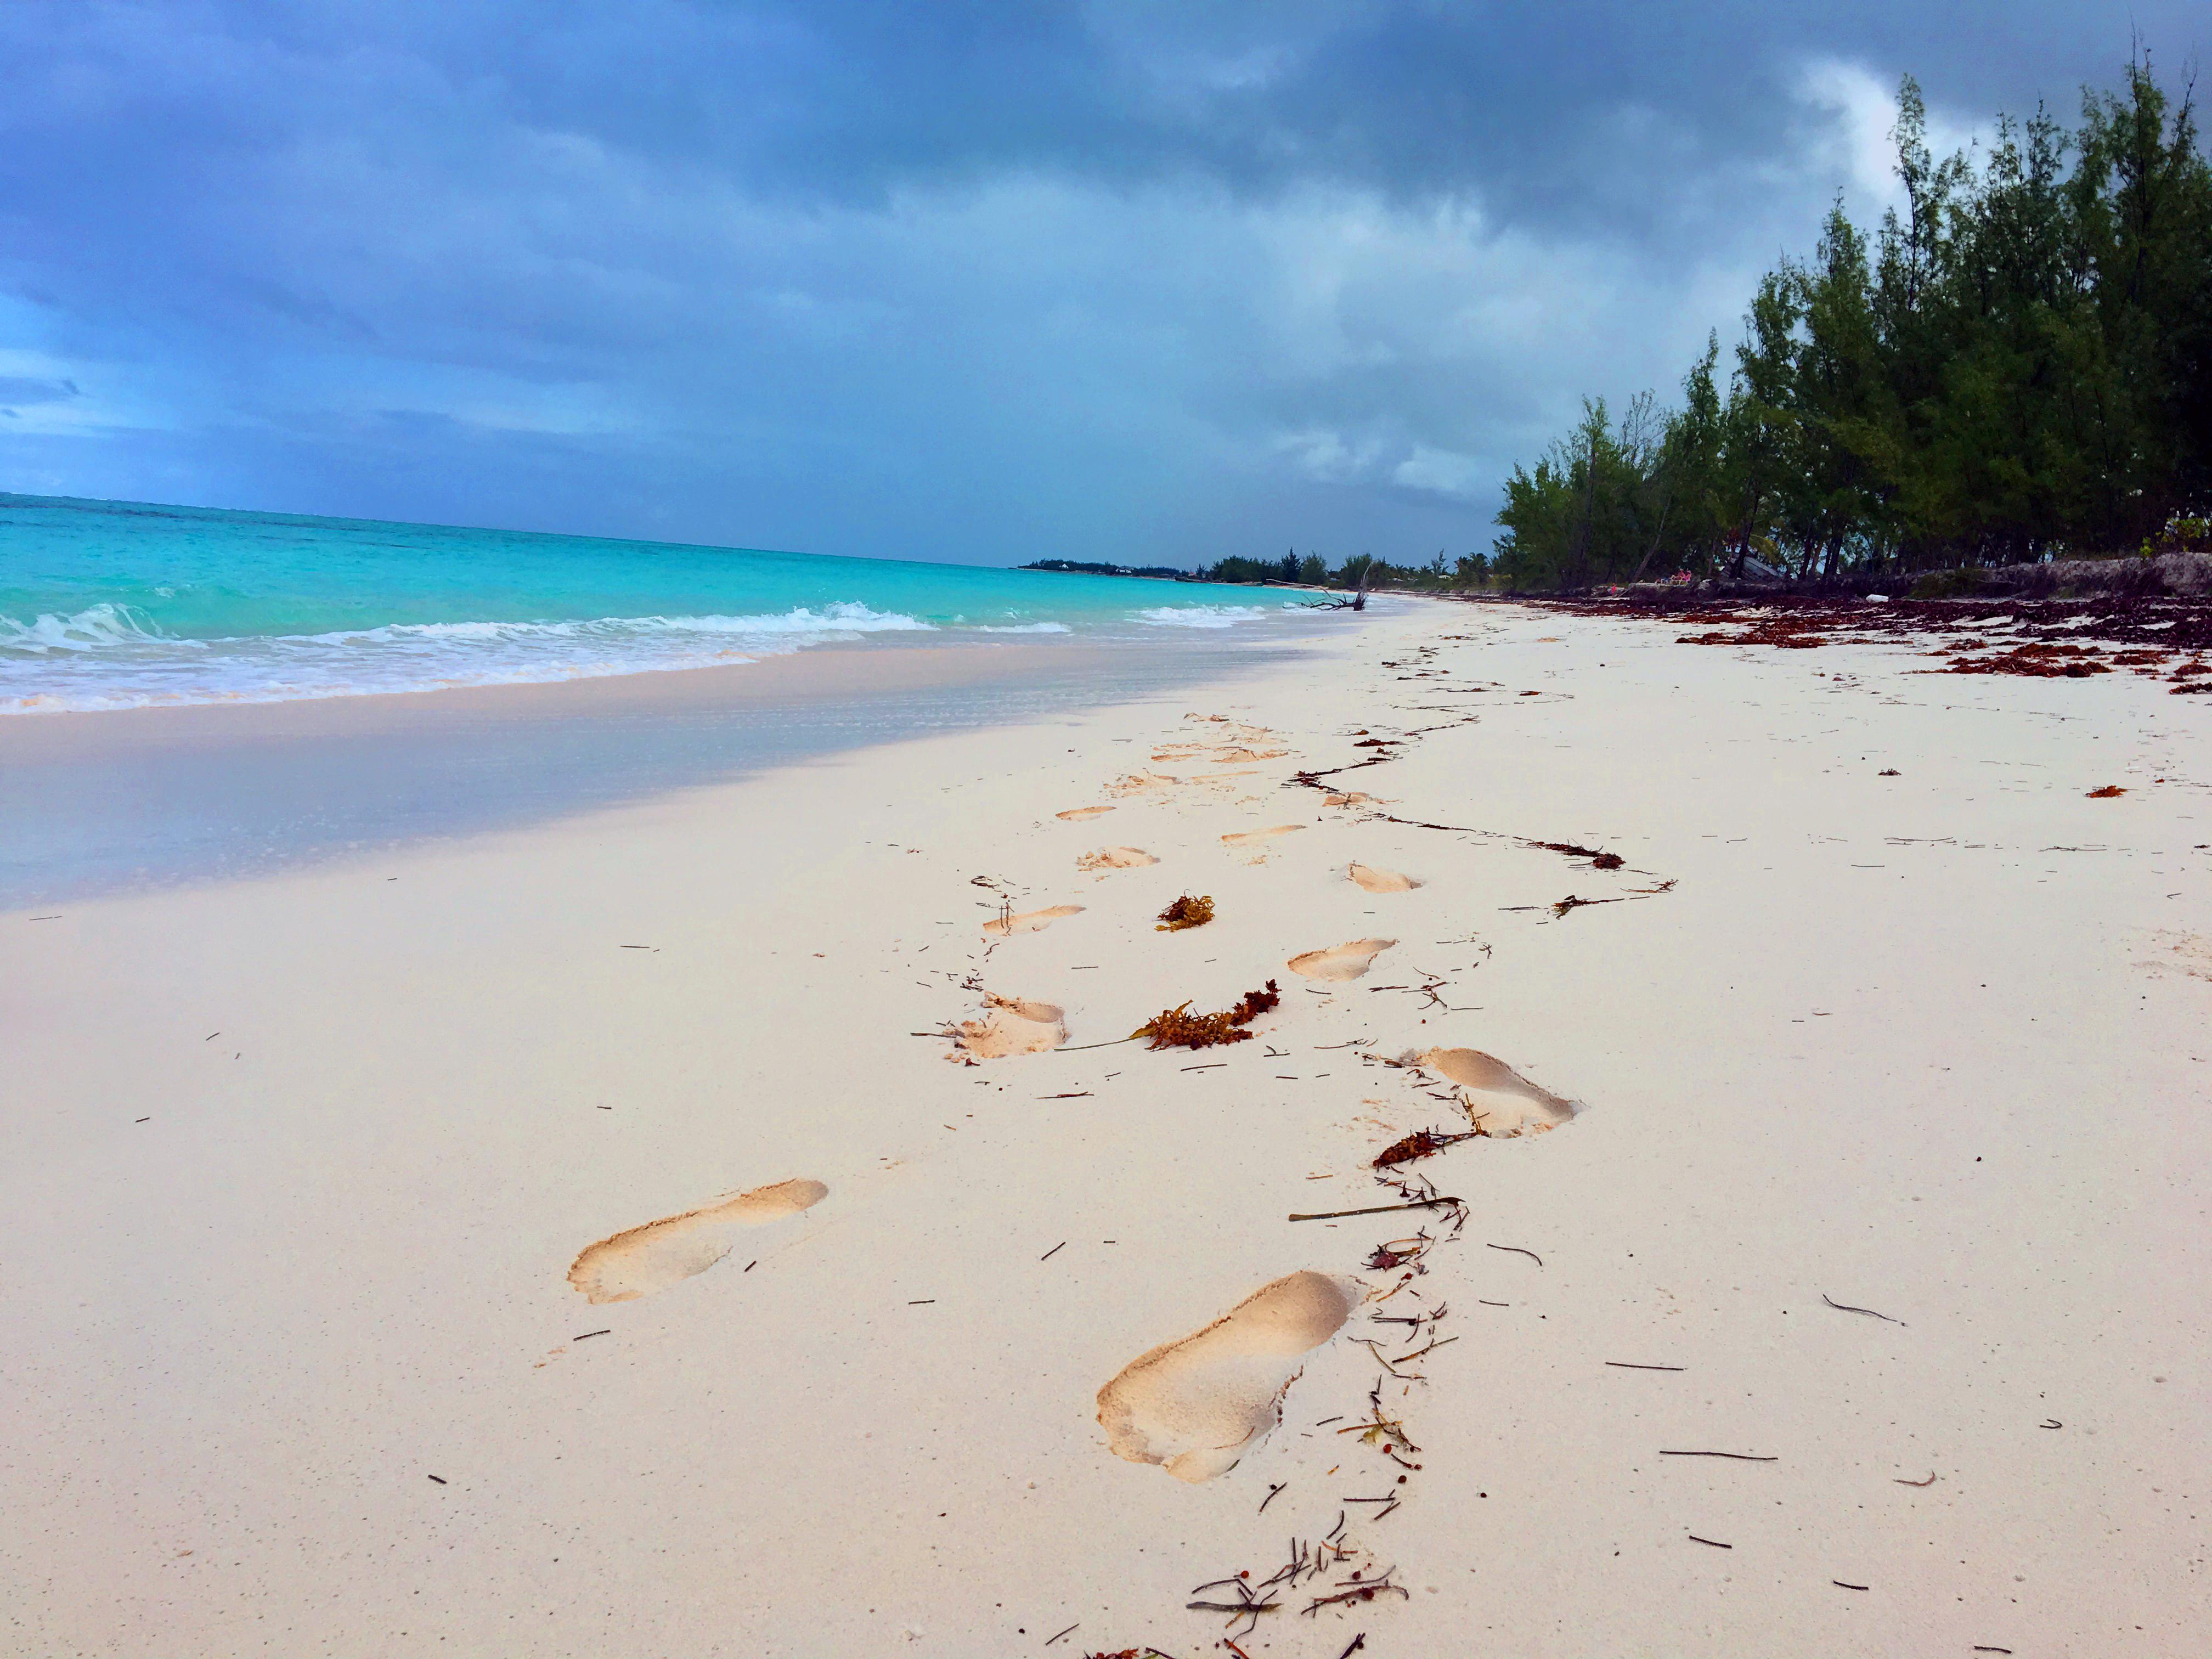 Whitby Beach, North Caicos